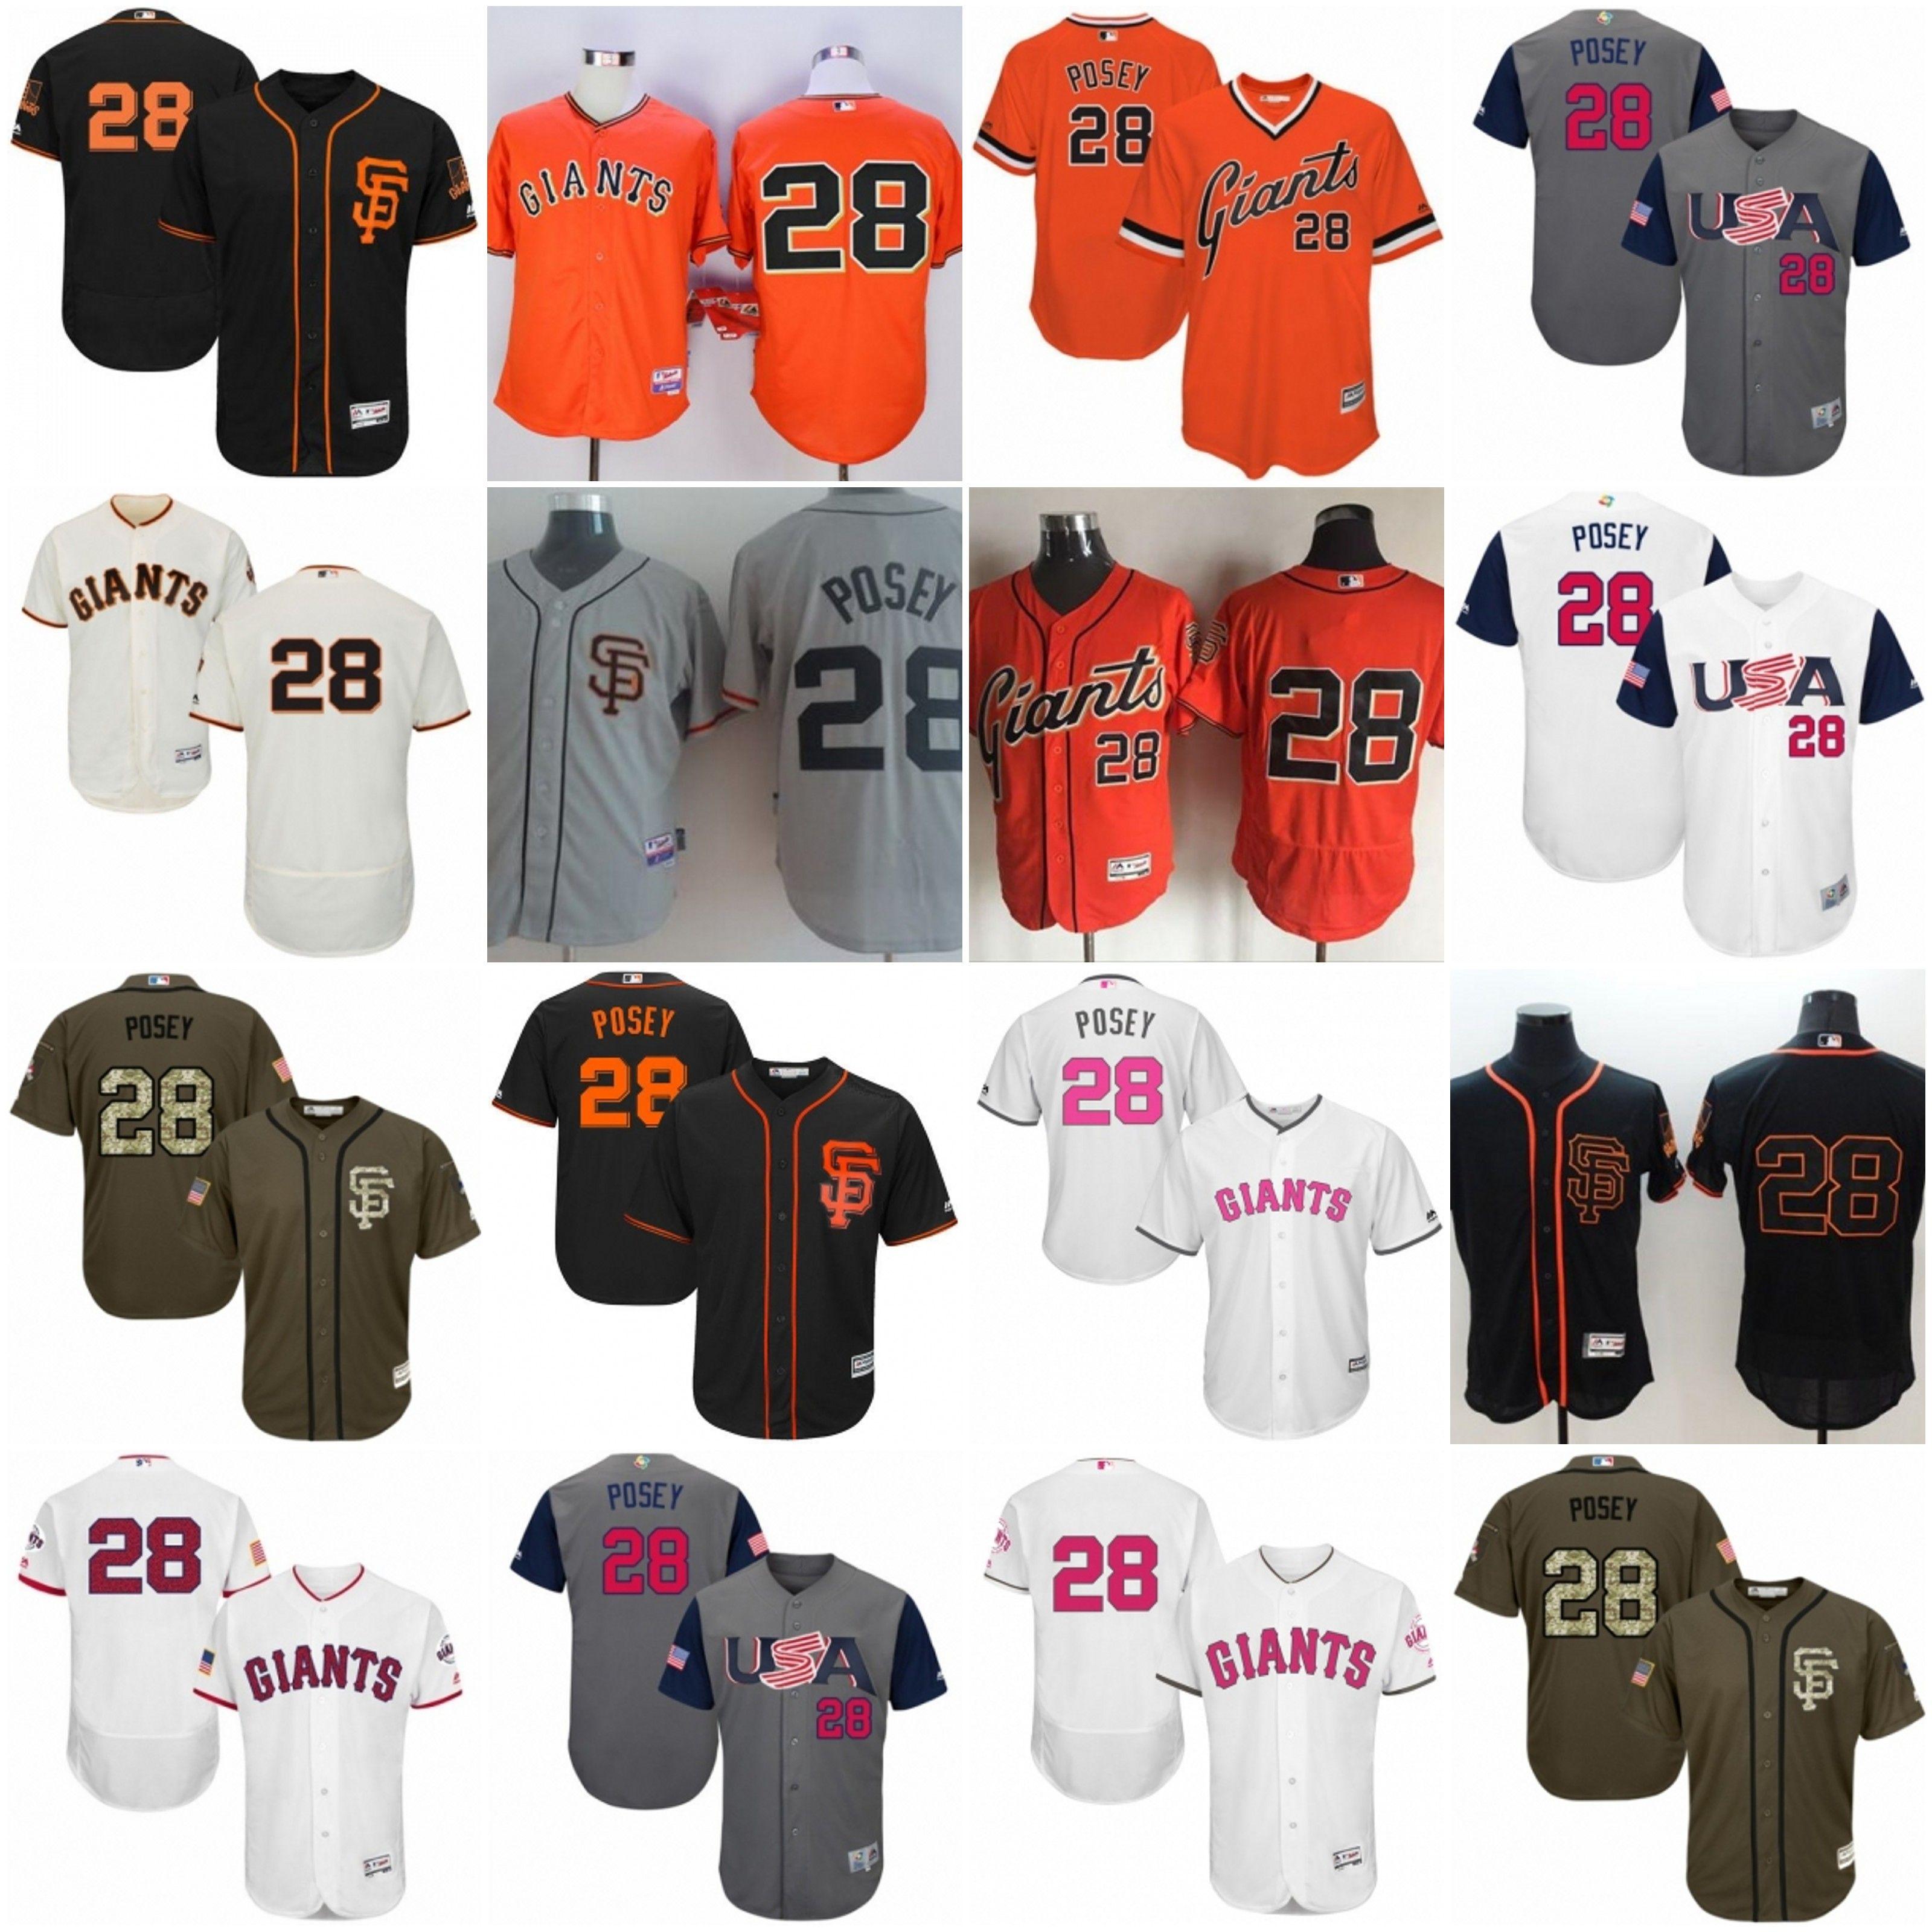 5c09d39e4 ... T-Shirt 2017 2017 28 Buster Posey Jersey San Francisco Mens Sf Black  White Fashion Stars Cream Orange 2017 San Francisco Giants ...